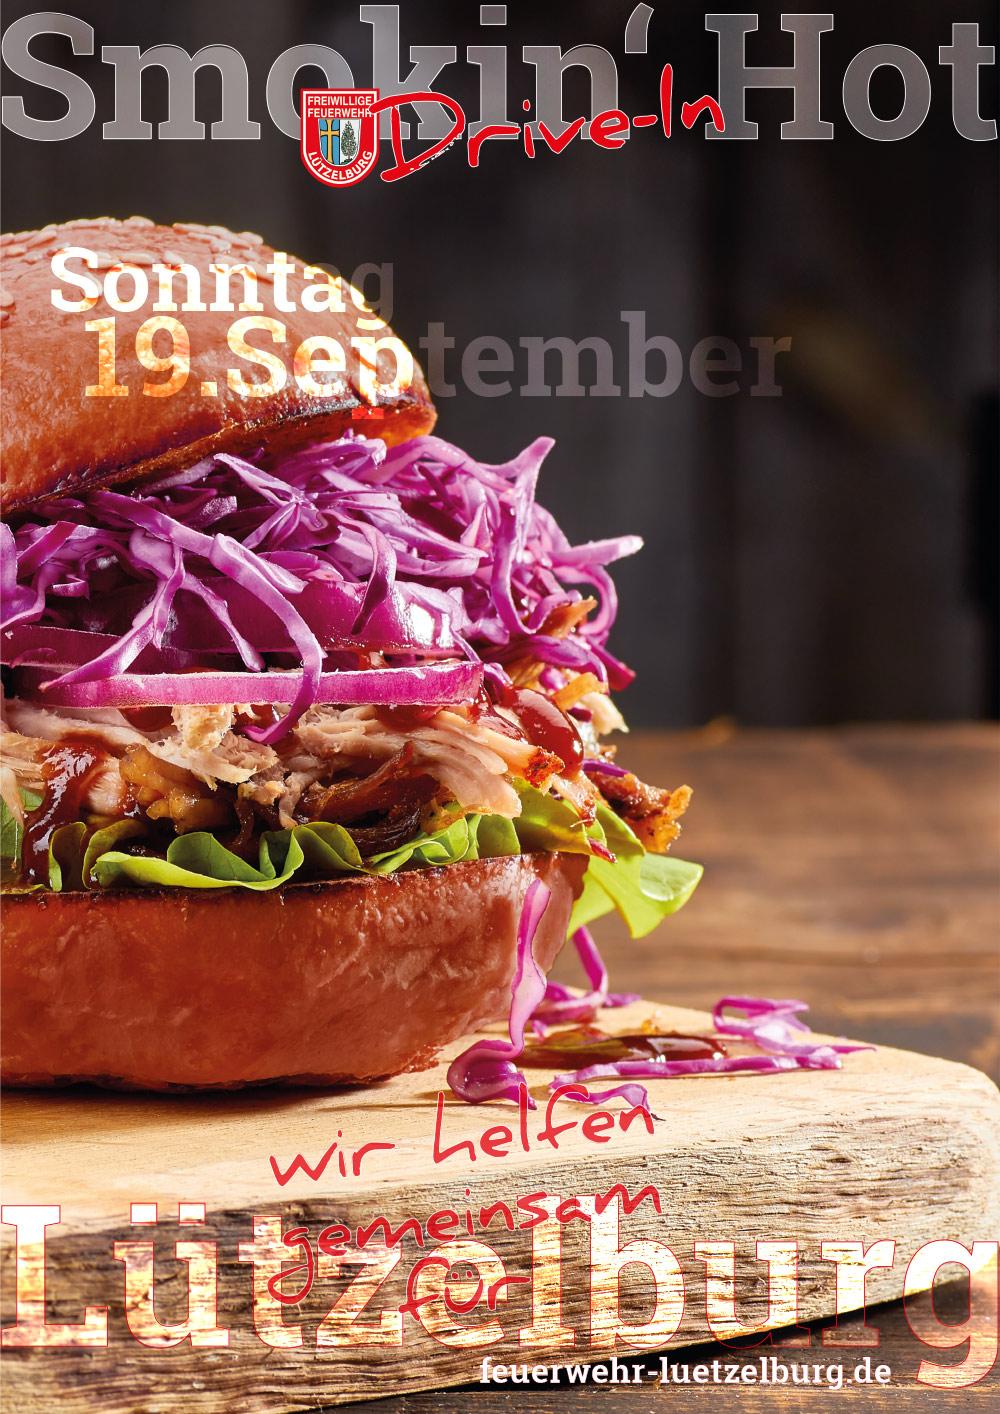 Pulled-Pork-Burger Drive-In am 19. September 2021